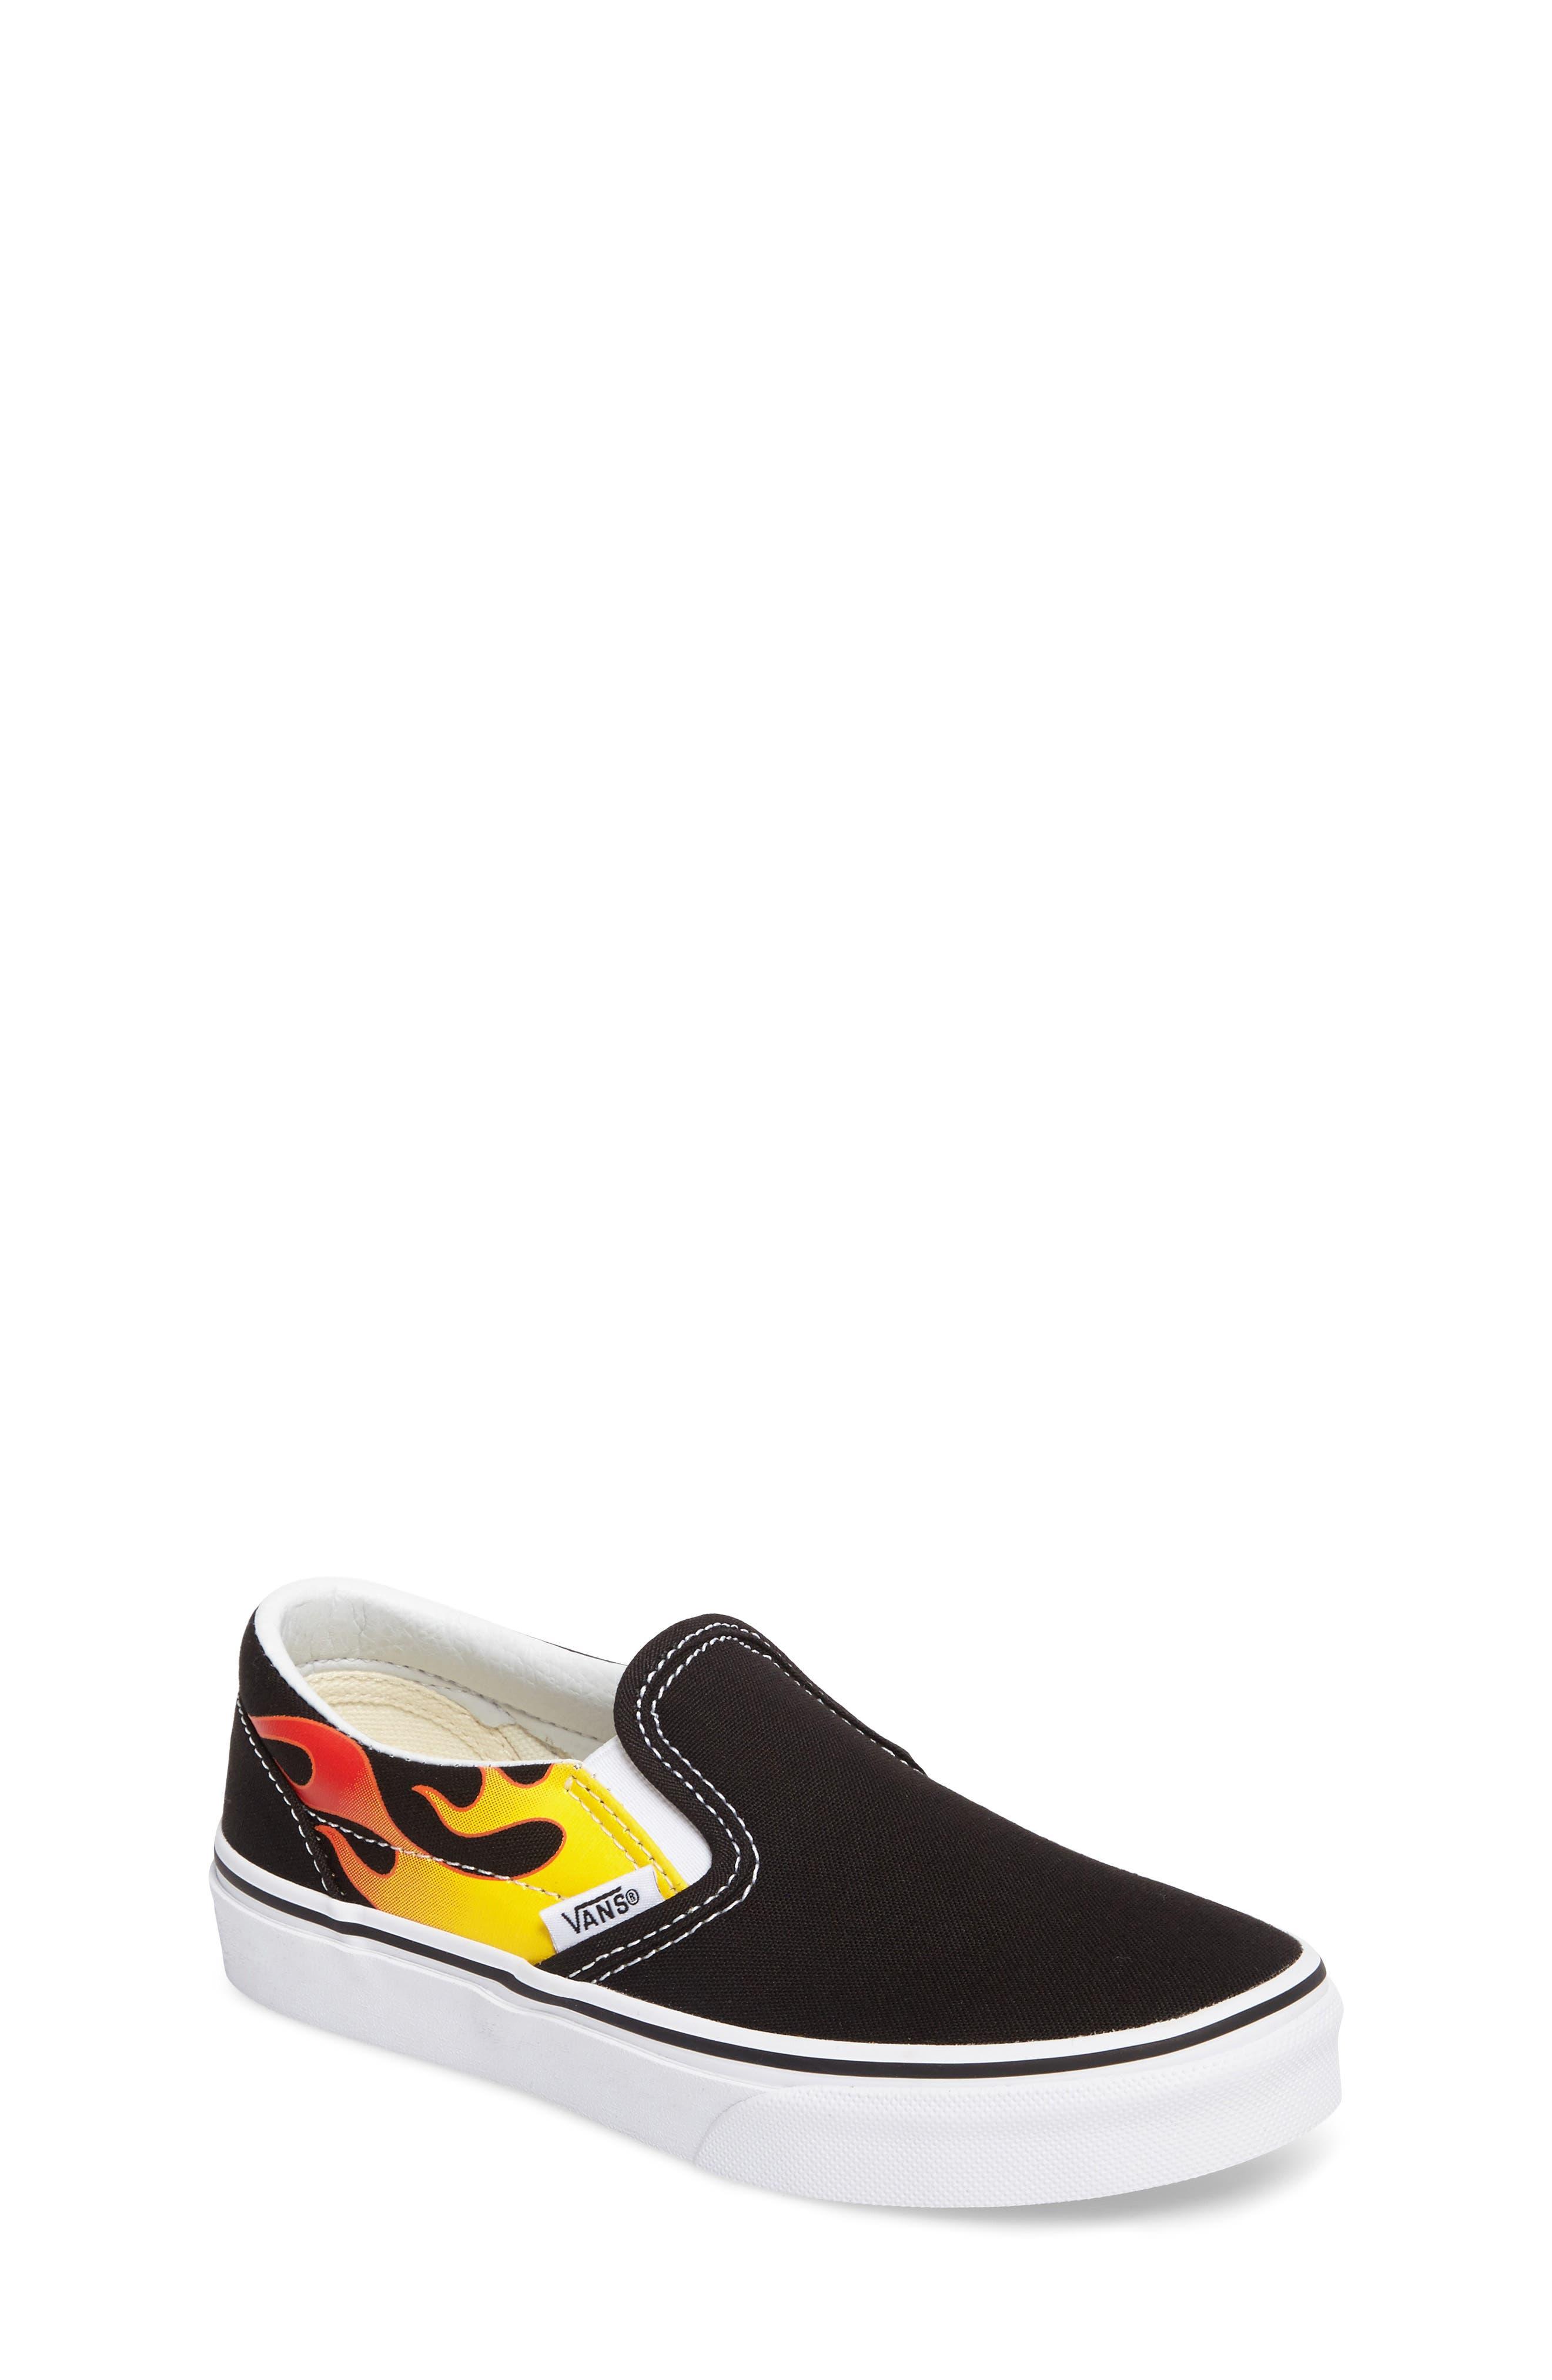 Alternate Image 1 Selected - Vans Flame Classic Slip-On Sneaker (Toddler, Little Kid & Big Kid)